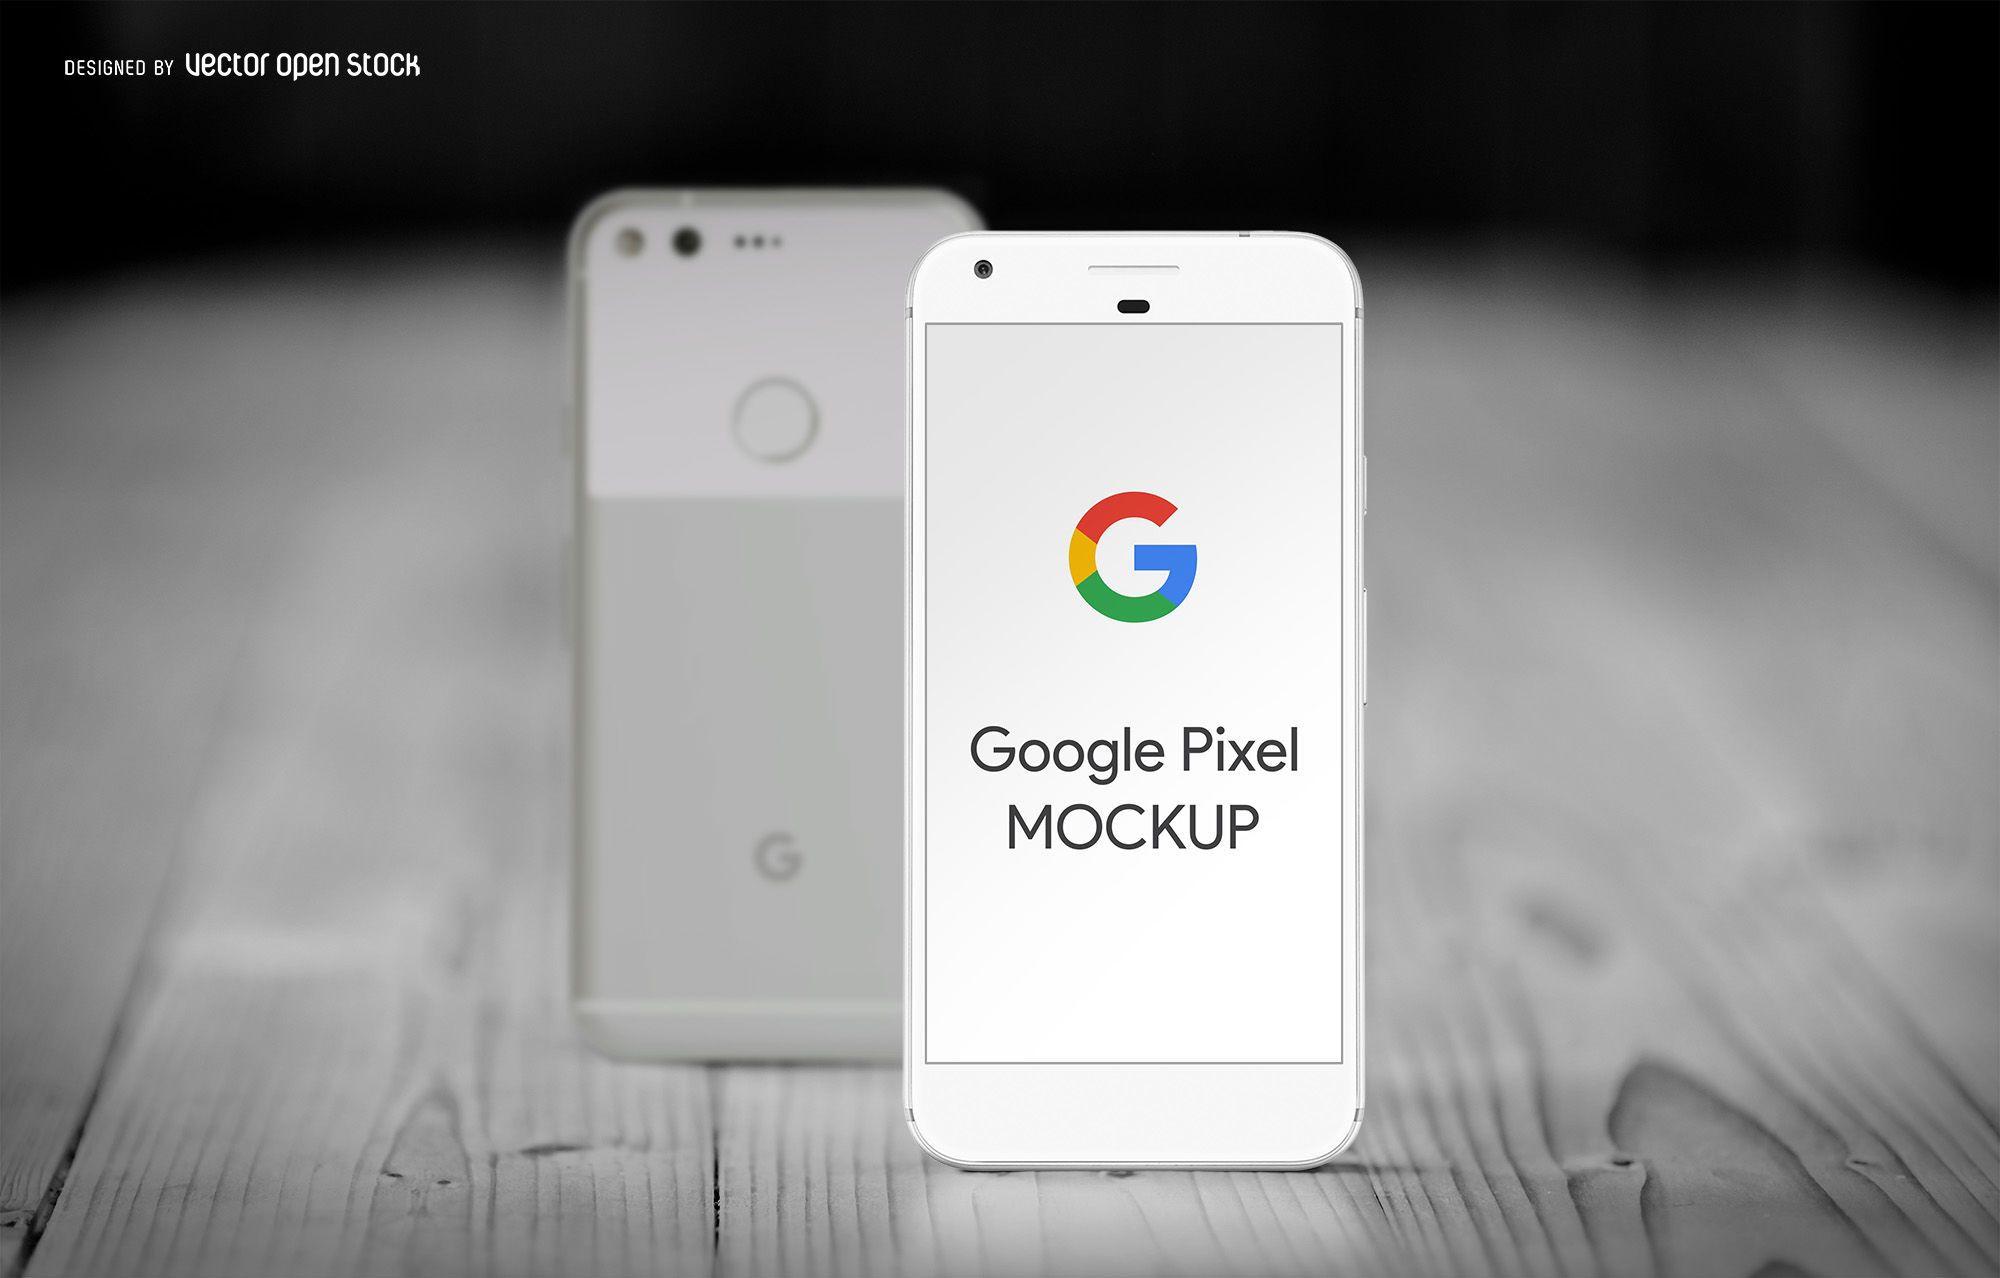 Google Pixel smartphone mockup